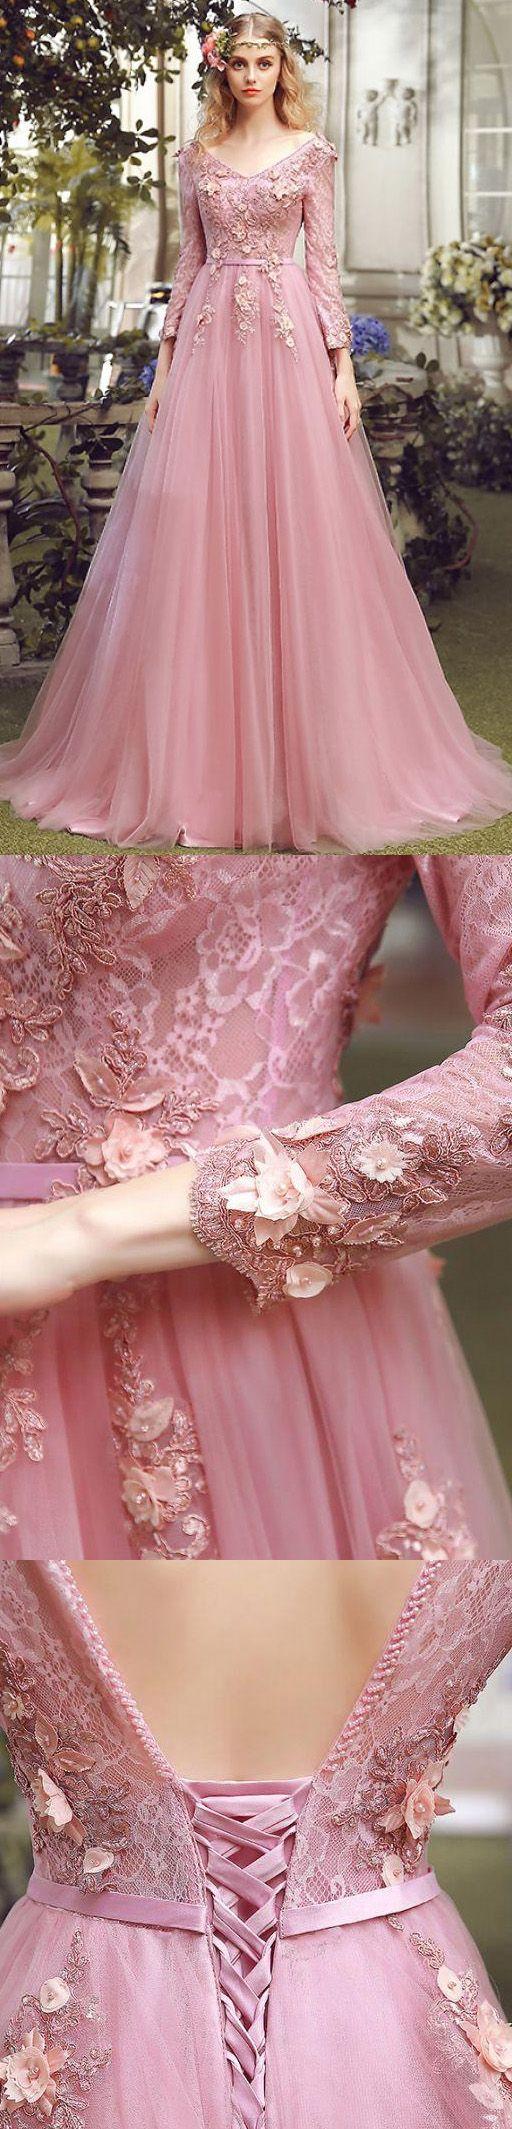 Long Sleeve Prom Dresses, Long Prom Dresses, Lace Prom Dresses, Pink Prom Dresses, Sexy Prom dresses, Prom Dresses Lace, Prom Long Dresses, Lace Long Sleeve Prom dresses, Long Lace Prom Dresses, Prom Dresses Long Sleeve, Long Sleeve Dresses, Long Sleeve Lace dresses, Long Evening Dresses, A-line Evening Dresses